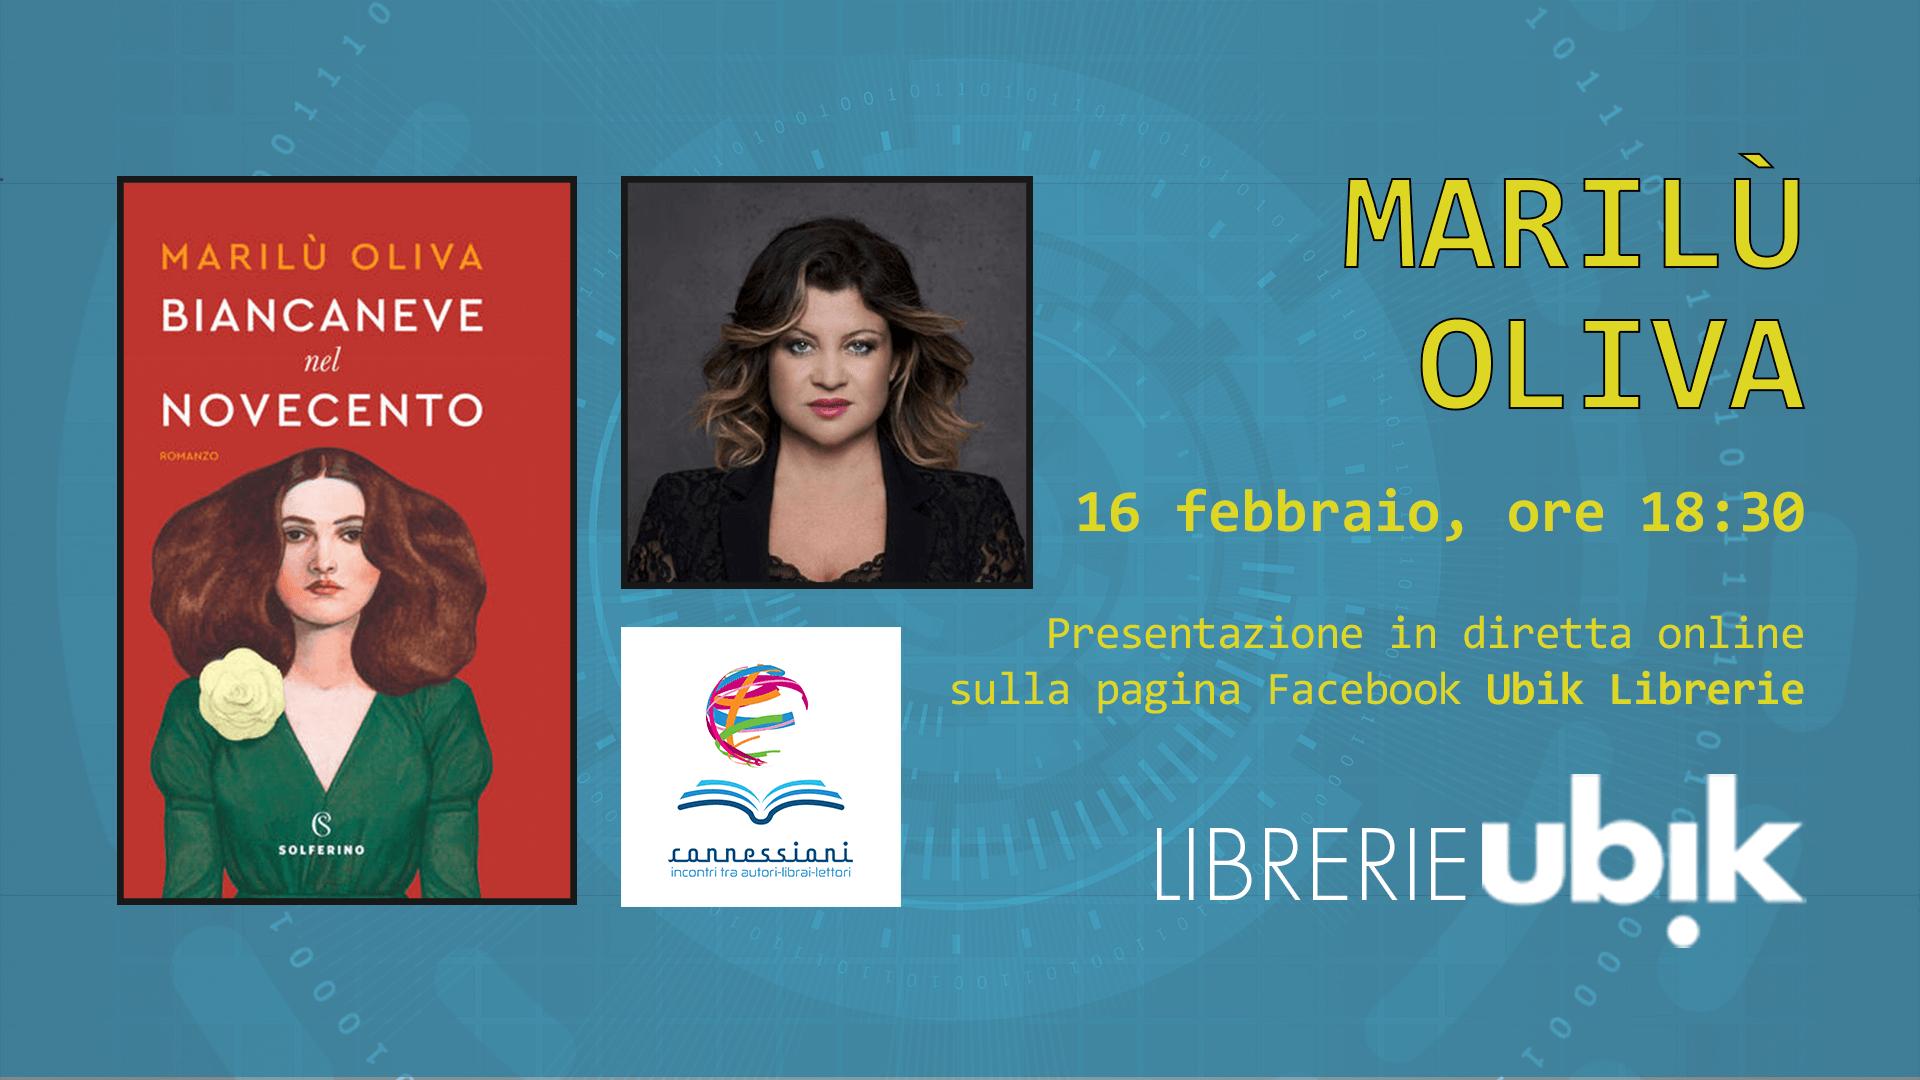 MARILÙ OLIVA presenta in diretta online